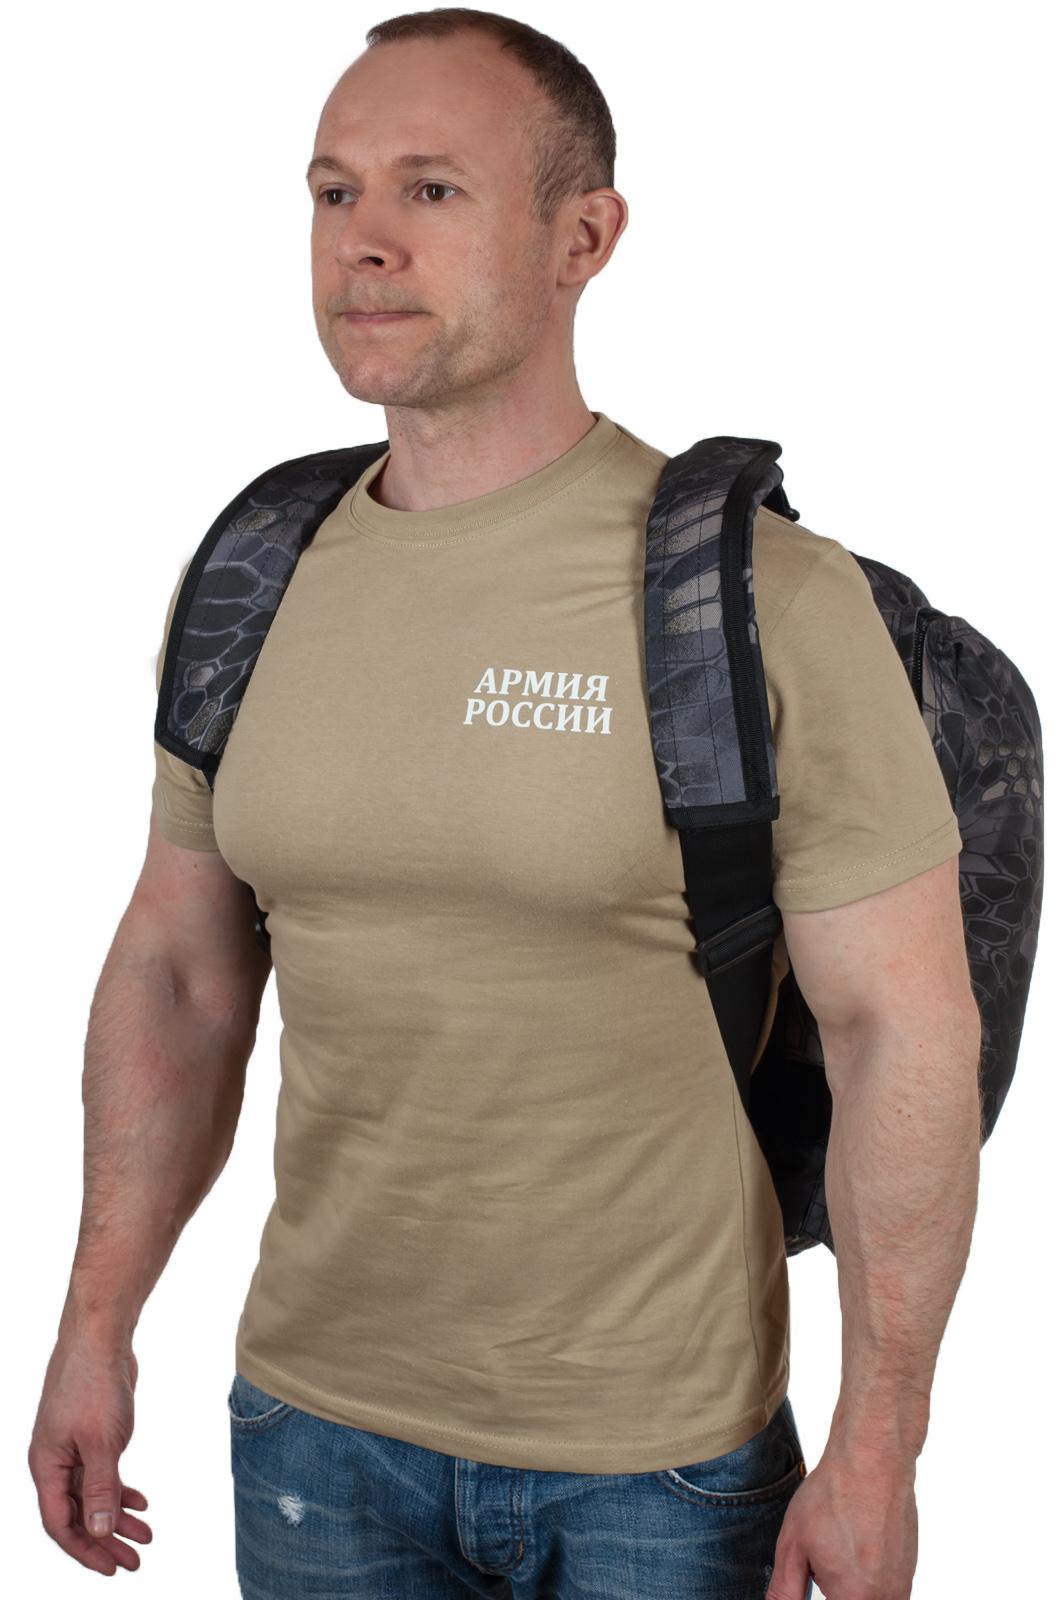 Спецназовская сумка с душой рюкзака